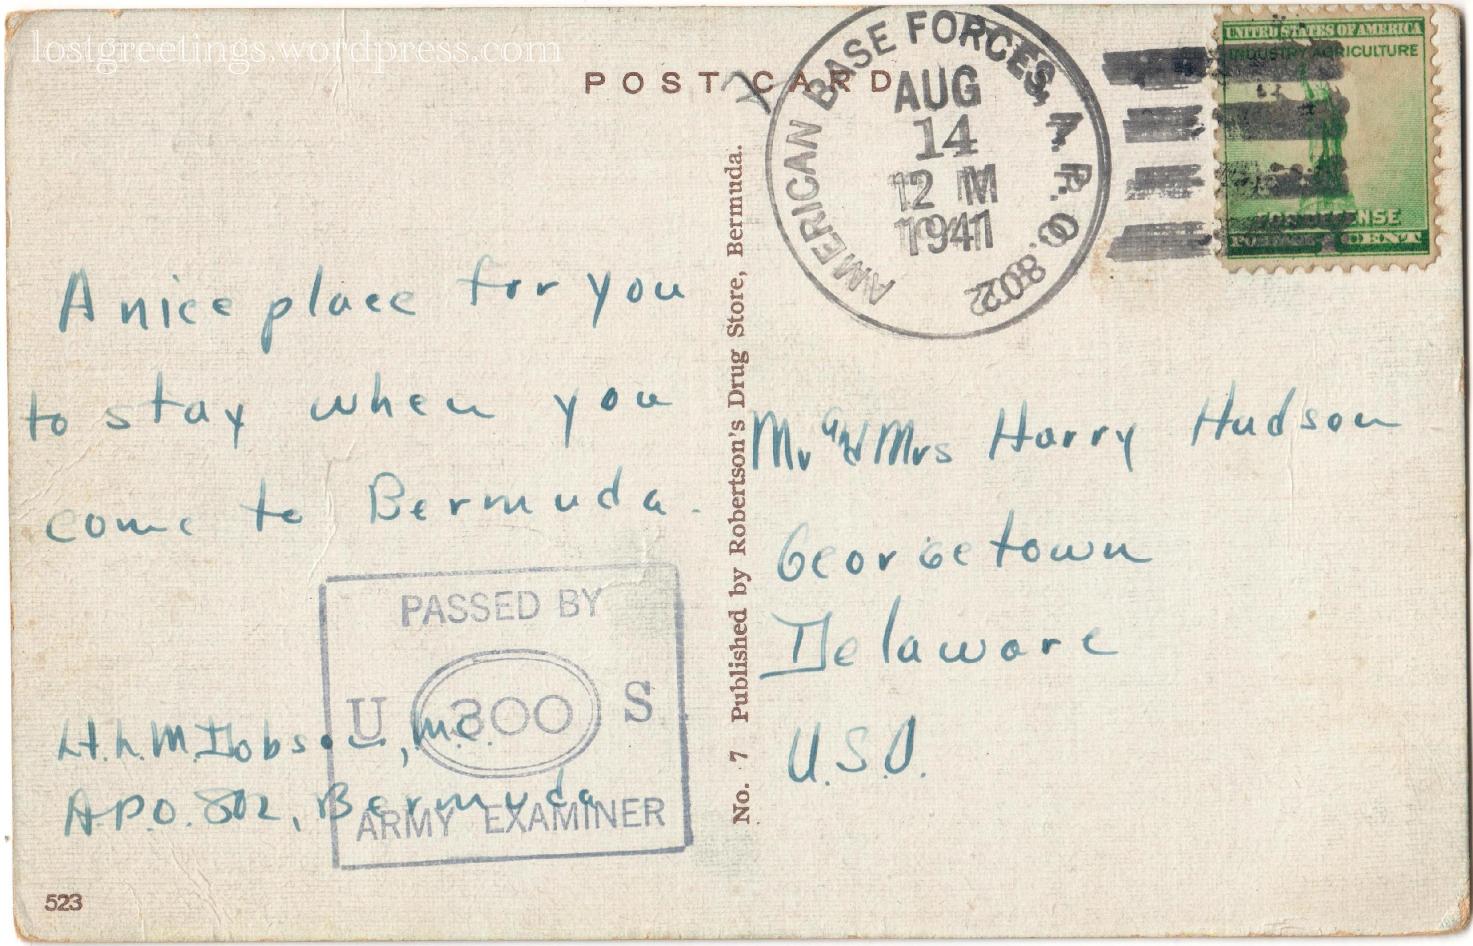 St George's, Bermuda APO 802 - 1941 Postcard Message lg